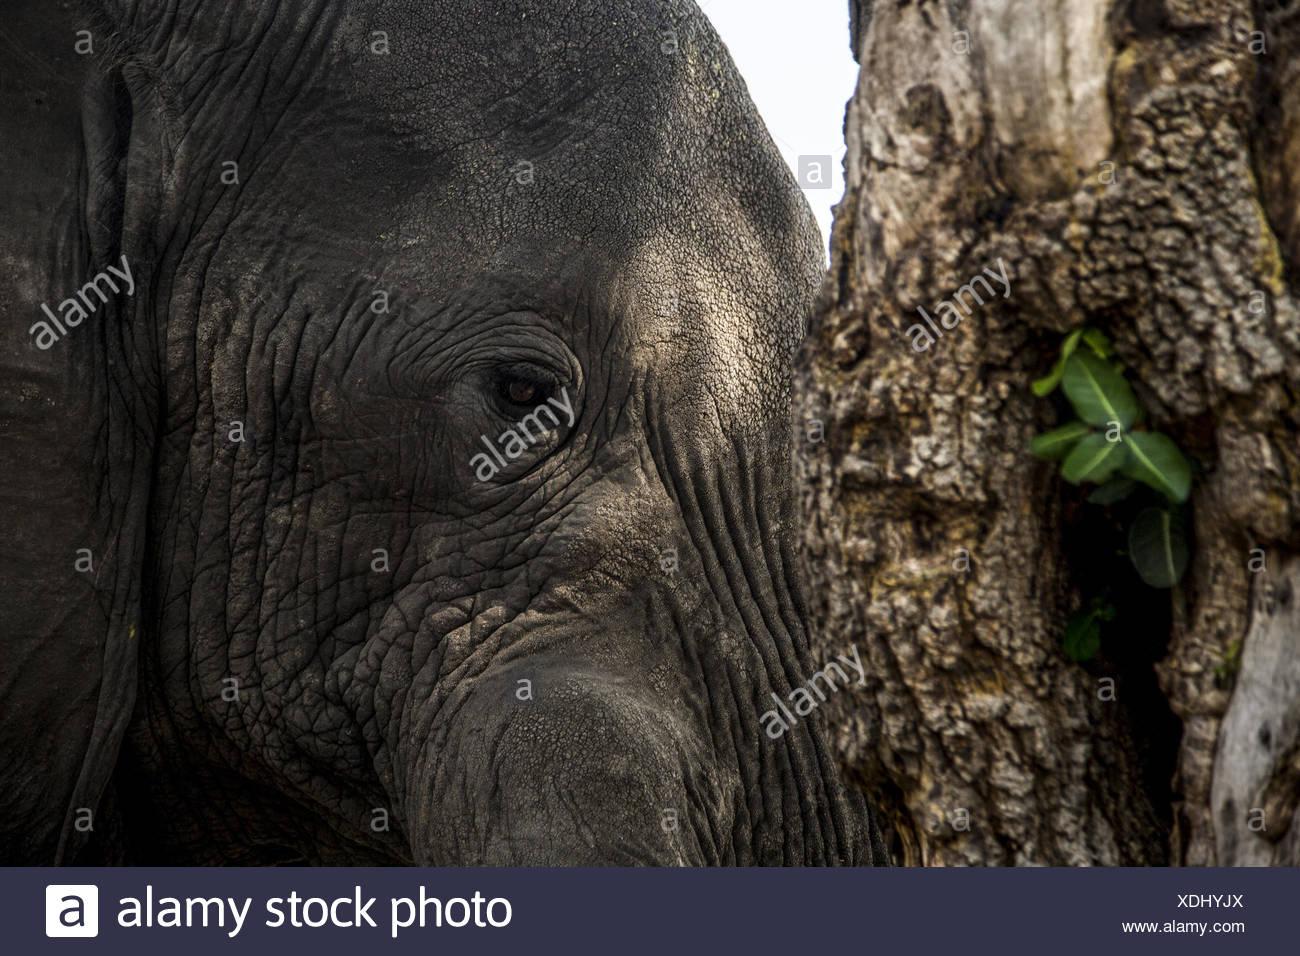 A close up of an Elephant, Loxodonta africana, next to a tree. - Stock Image